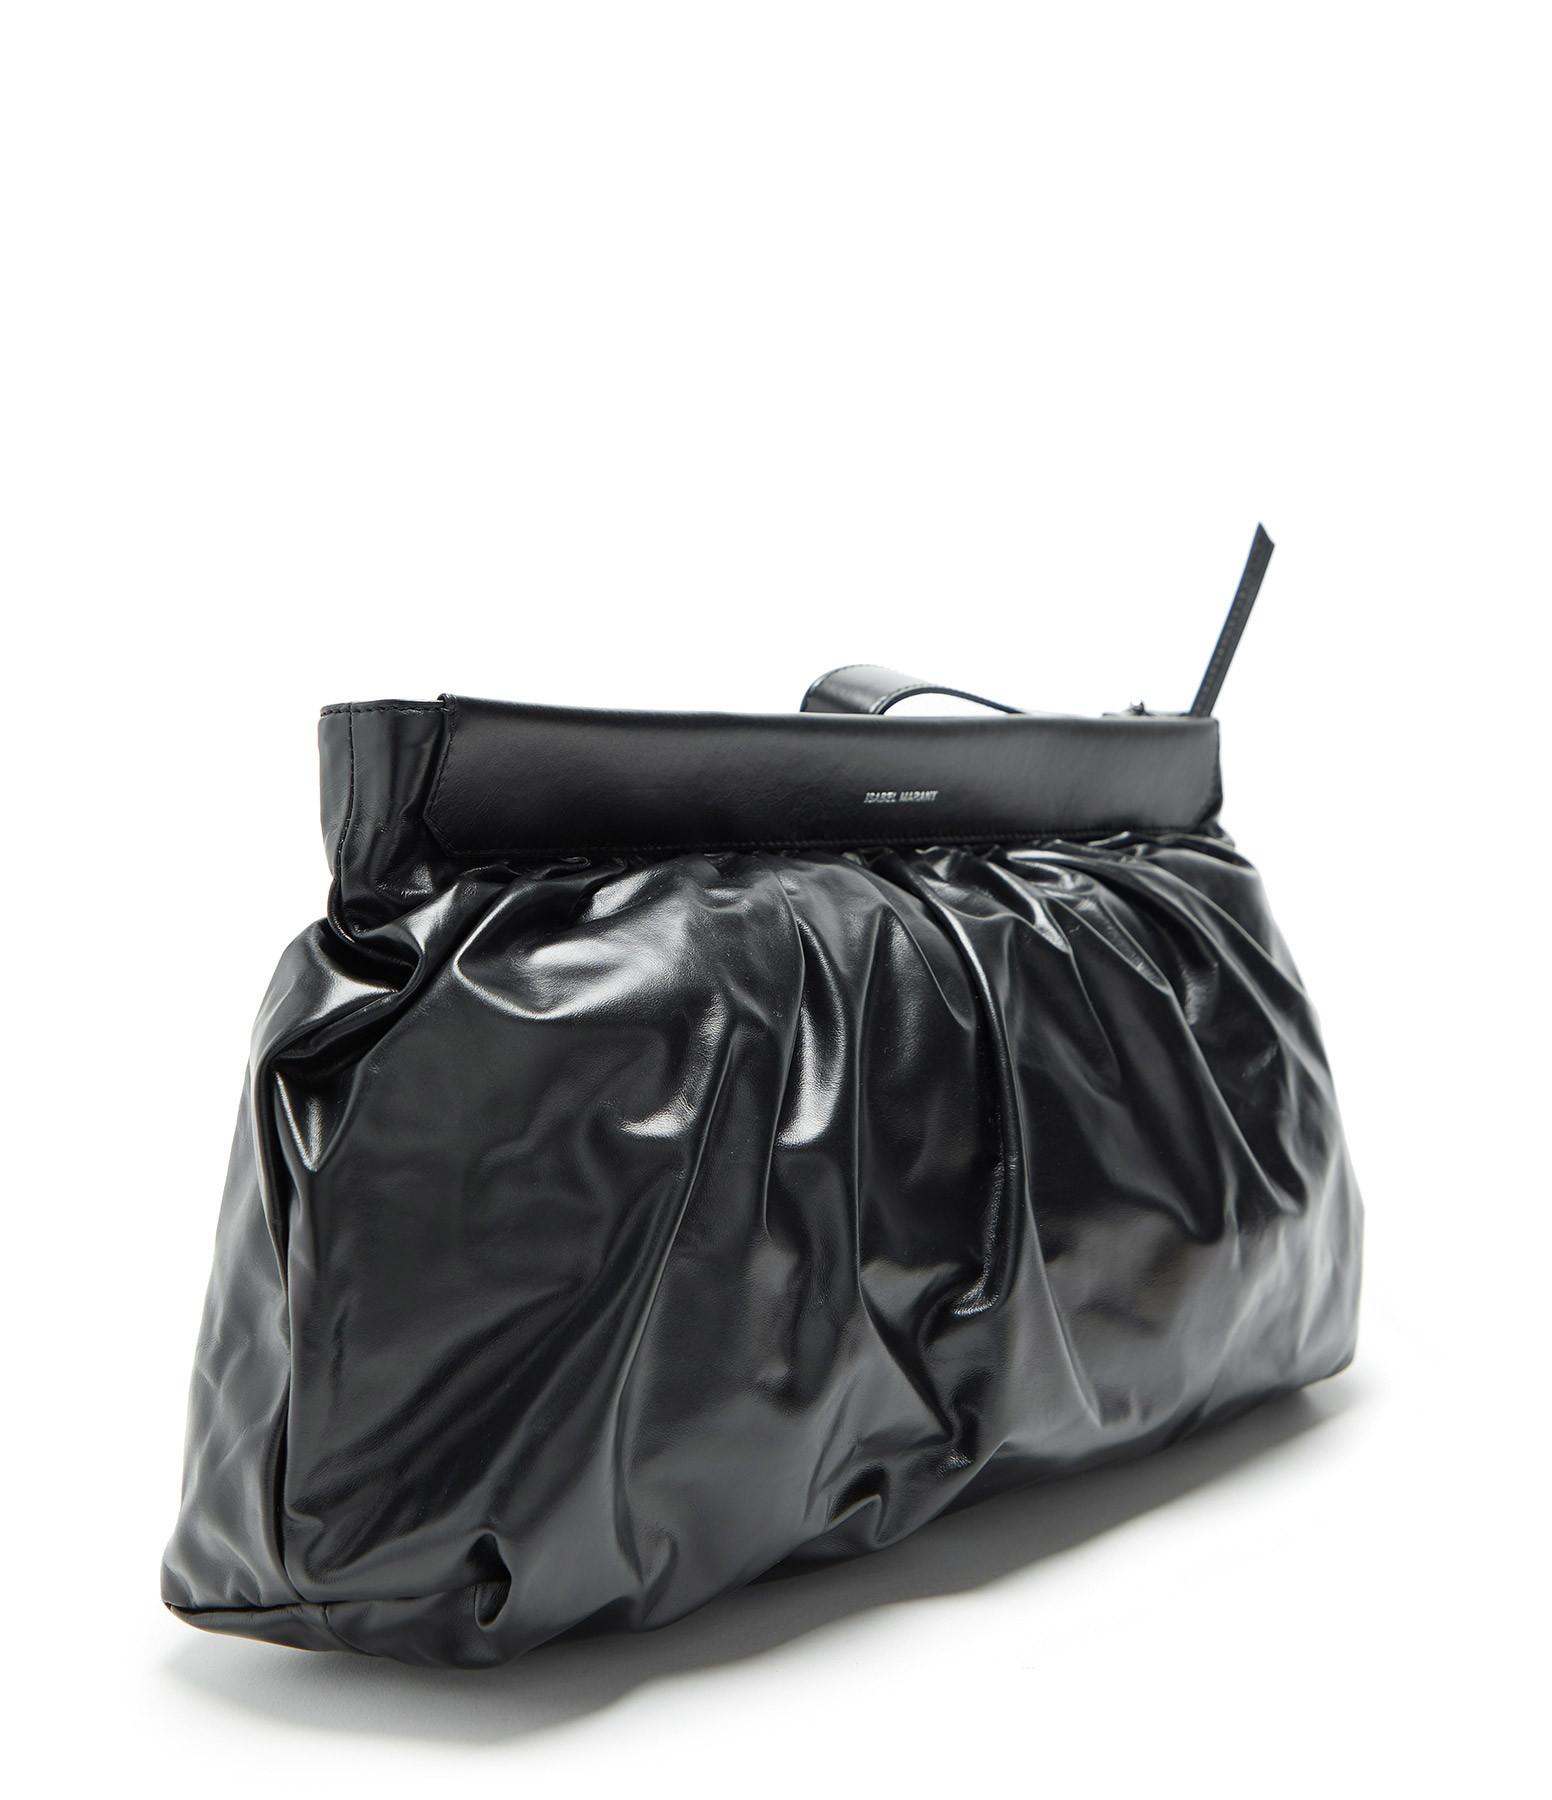 ISABEL MARANT - Pochette Luzel Cuir Noir